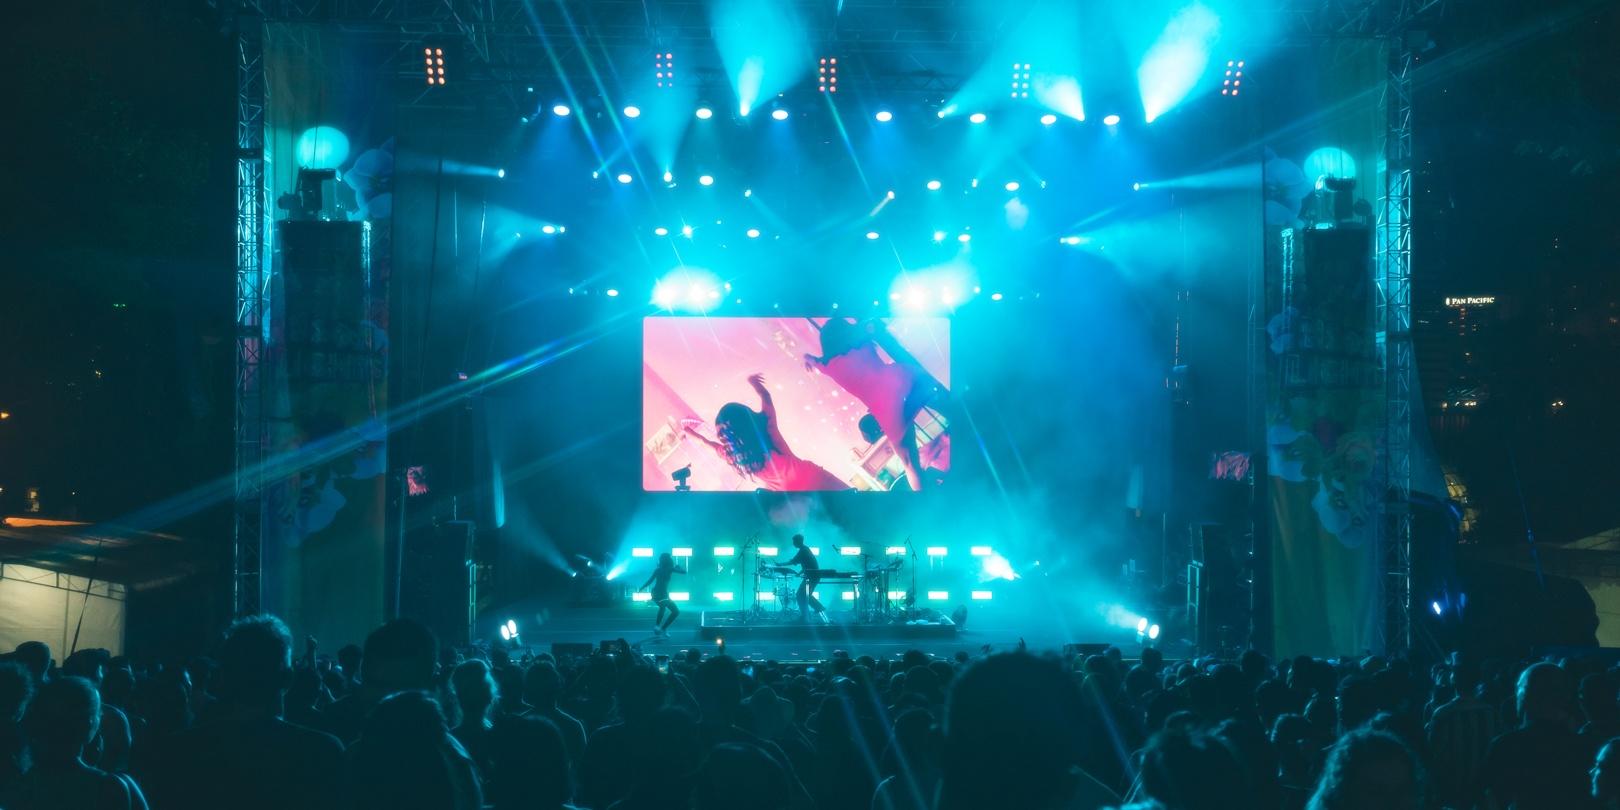 Festival report: 9 highlights of Neon Lights 2019